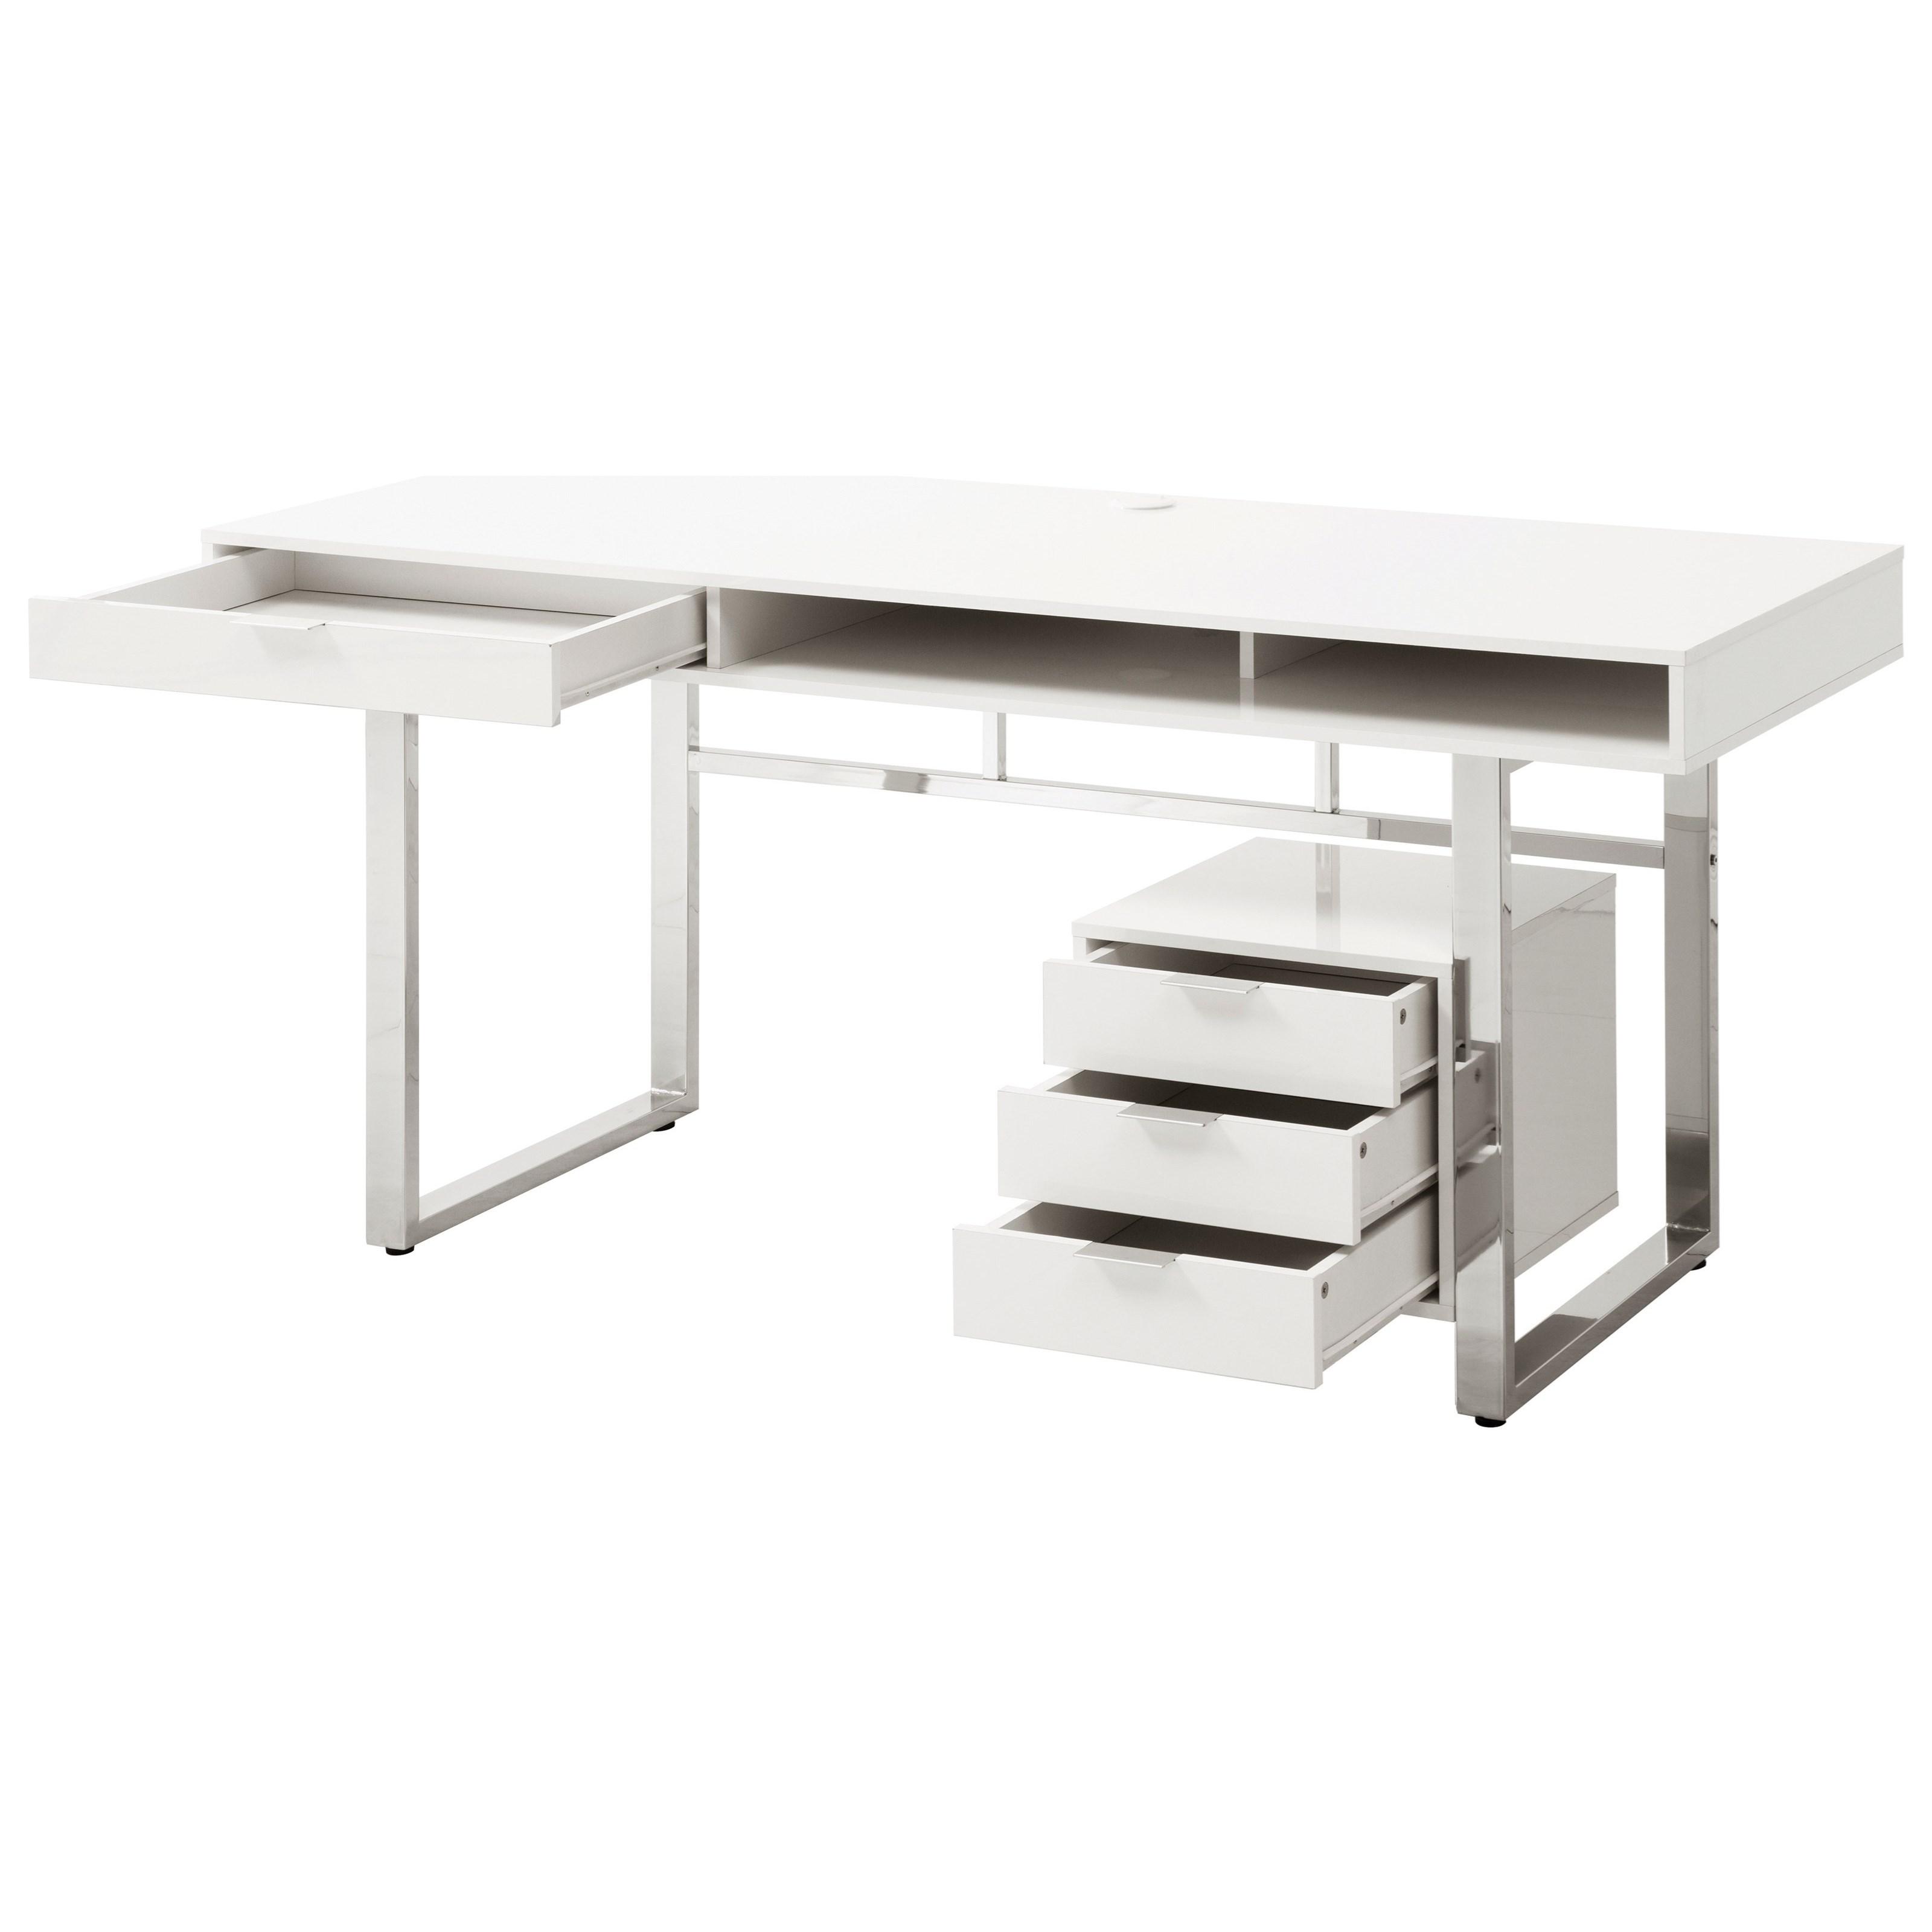 Coaster Desk; Coaster Desk